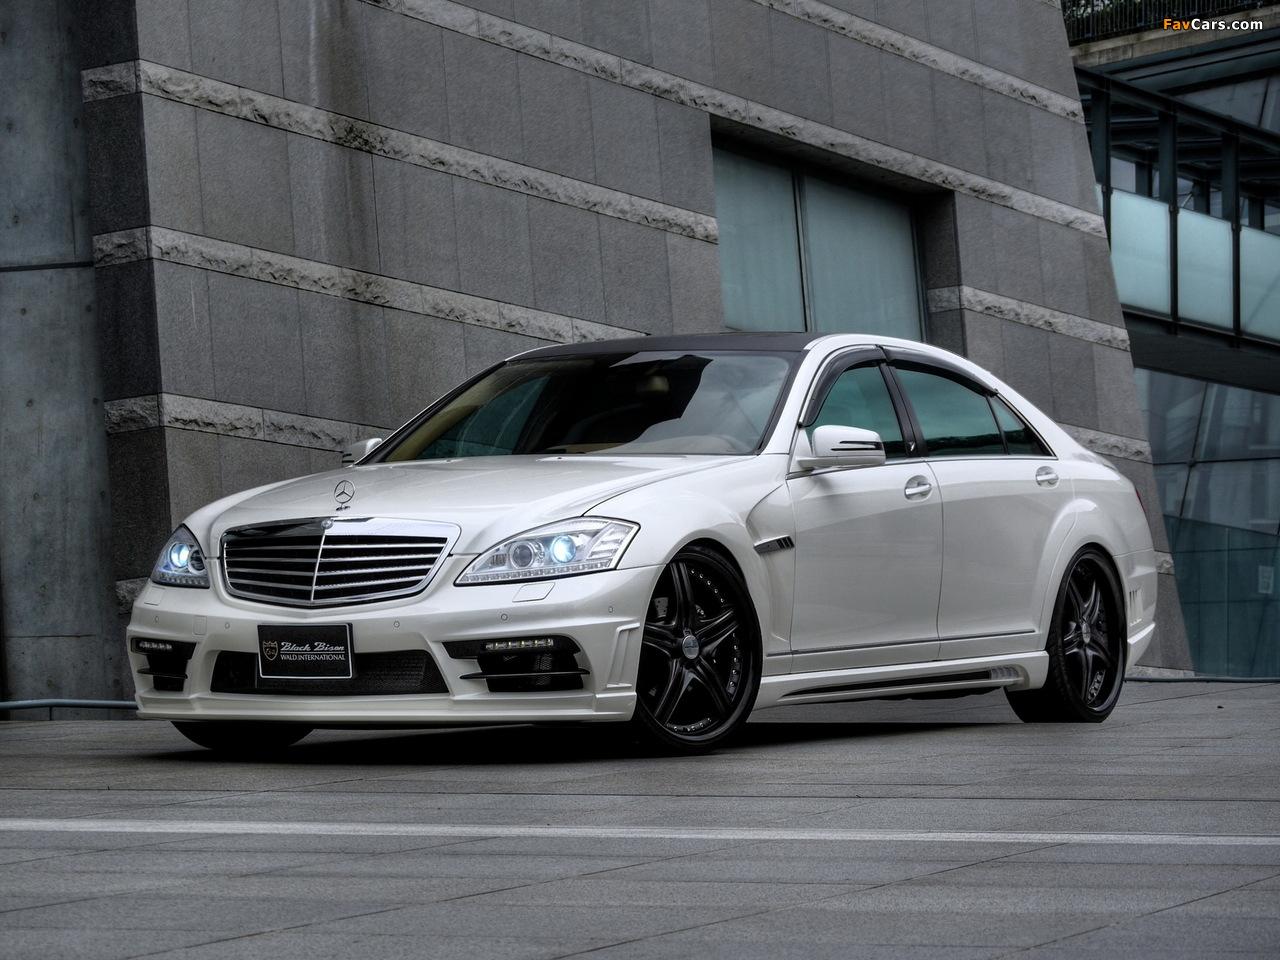 WALD Mercedes-Benz S-Klasse Black Bison Edition Sports Line (W221) 2010–13 pictures (1280 x 960)